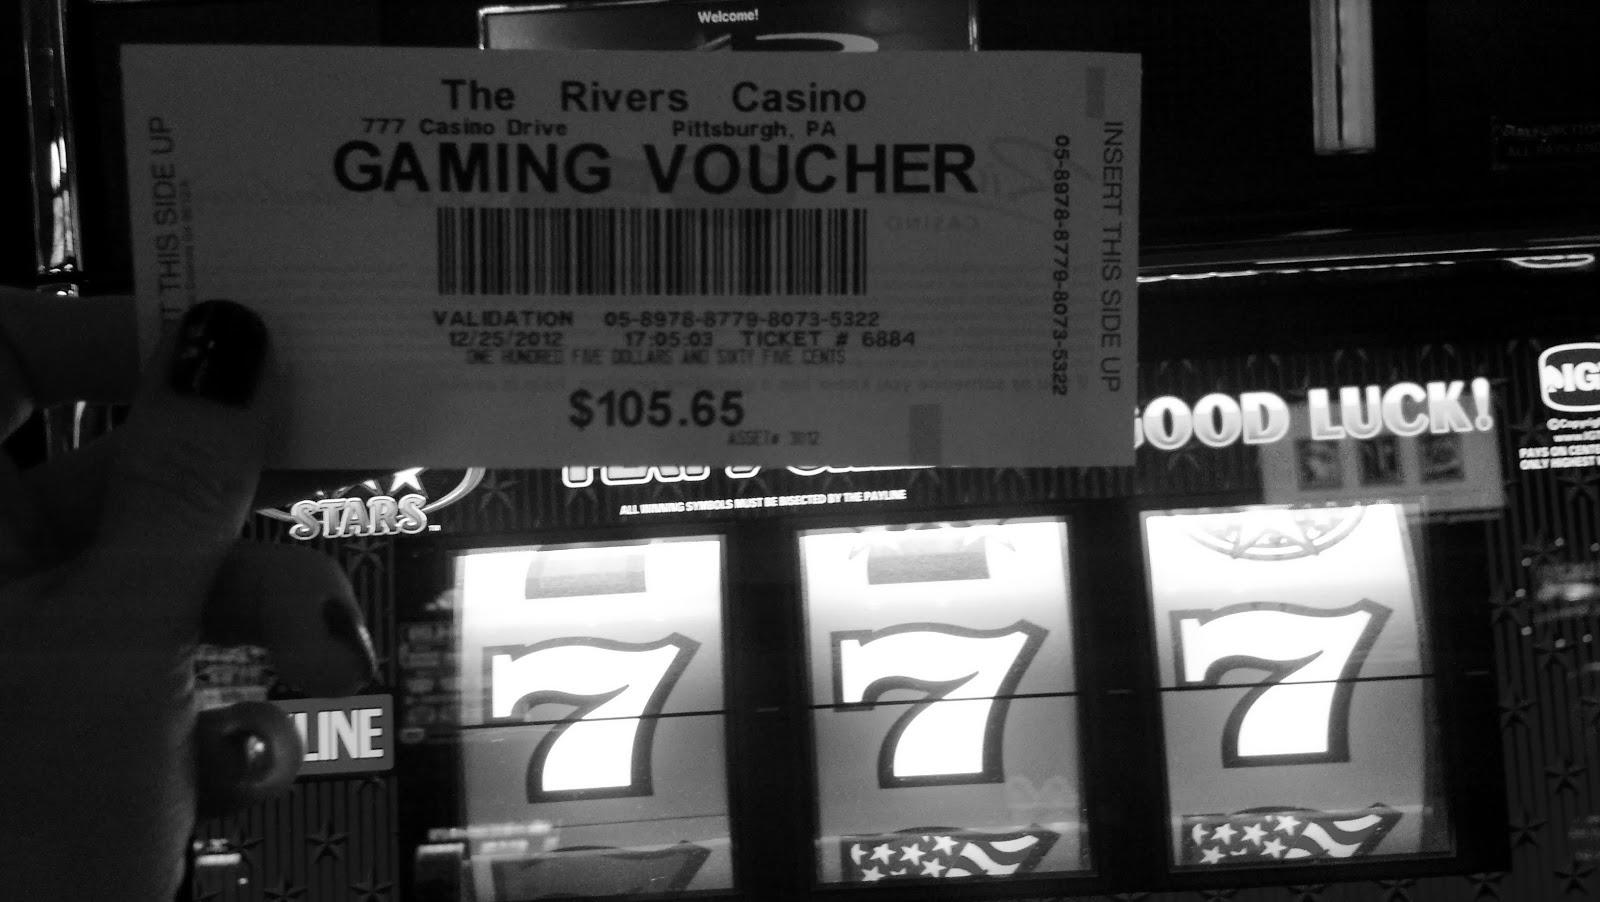 Gta 5 slot machine odds